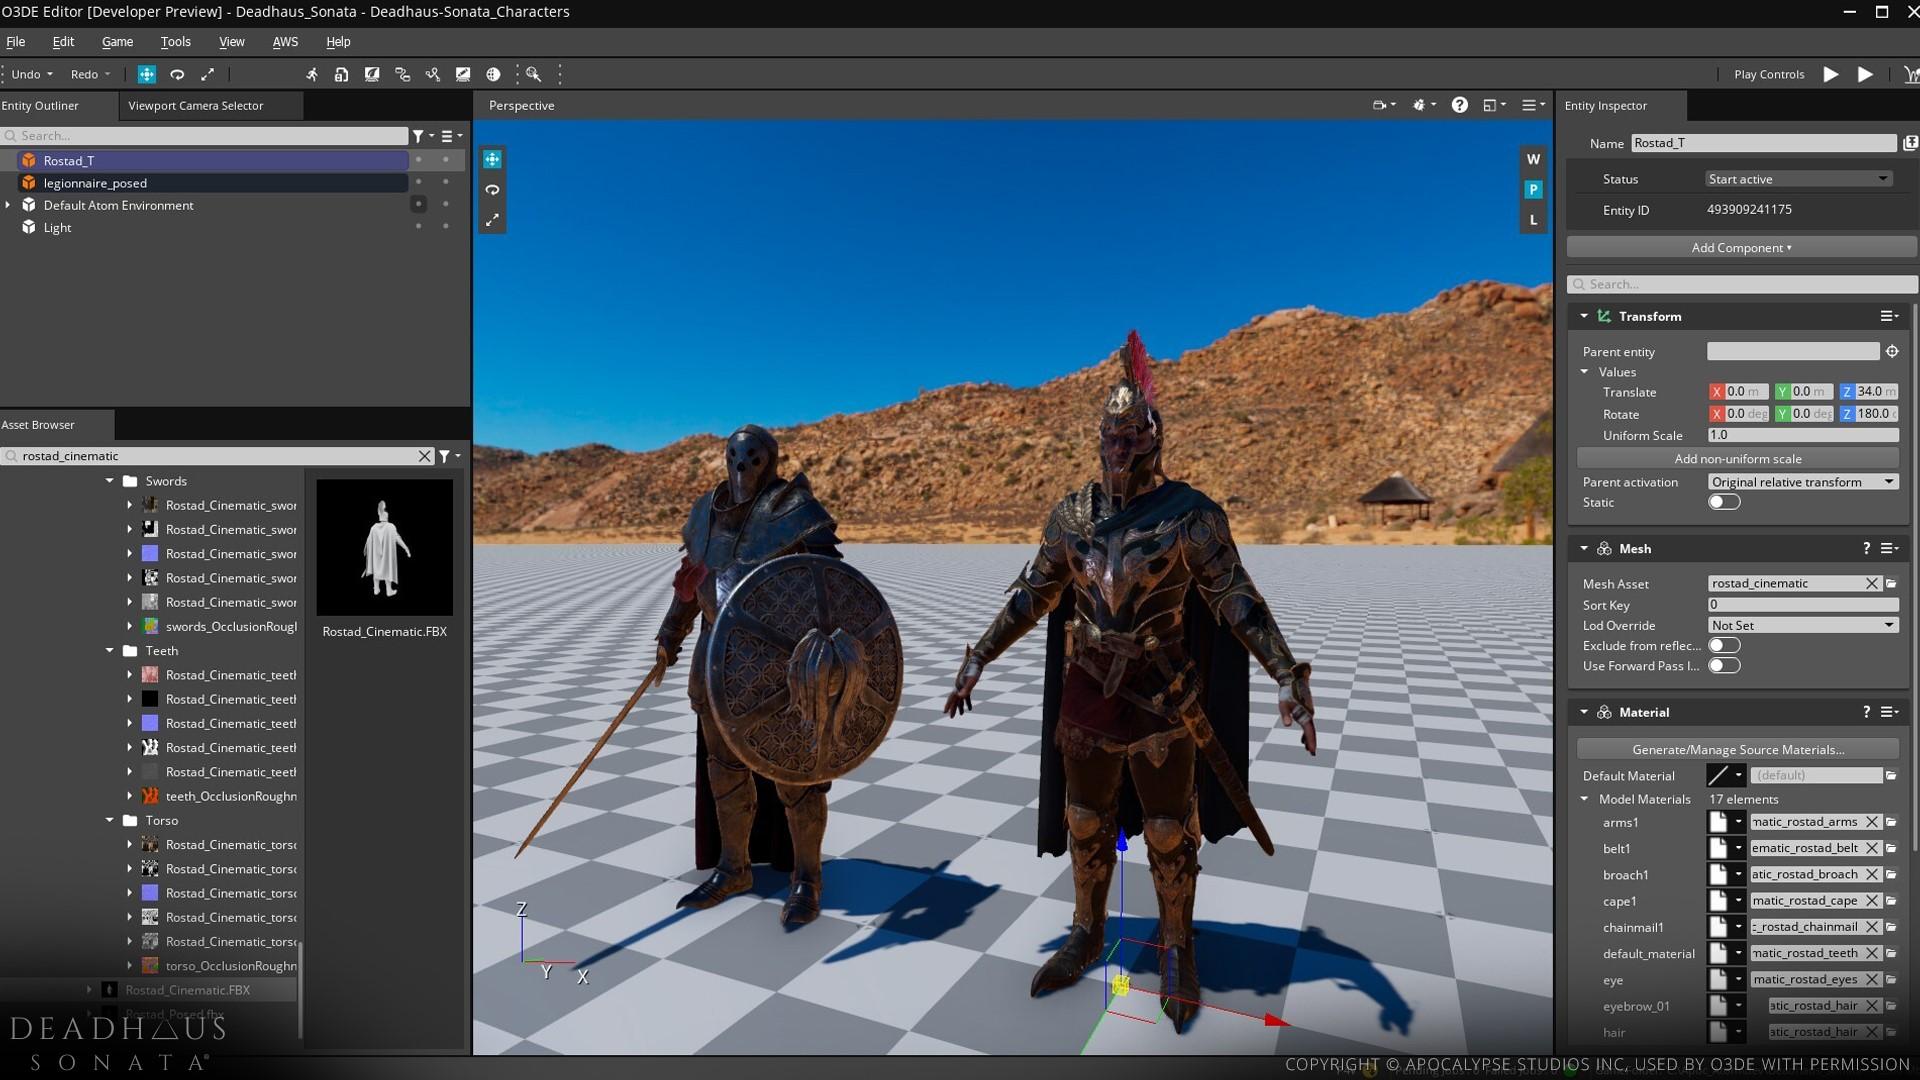 Apocalypse Studios character models in the O3DE Editor.